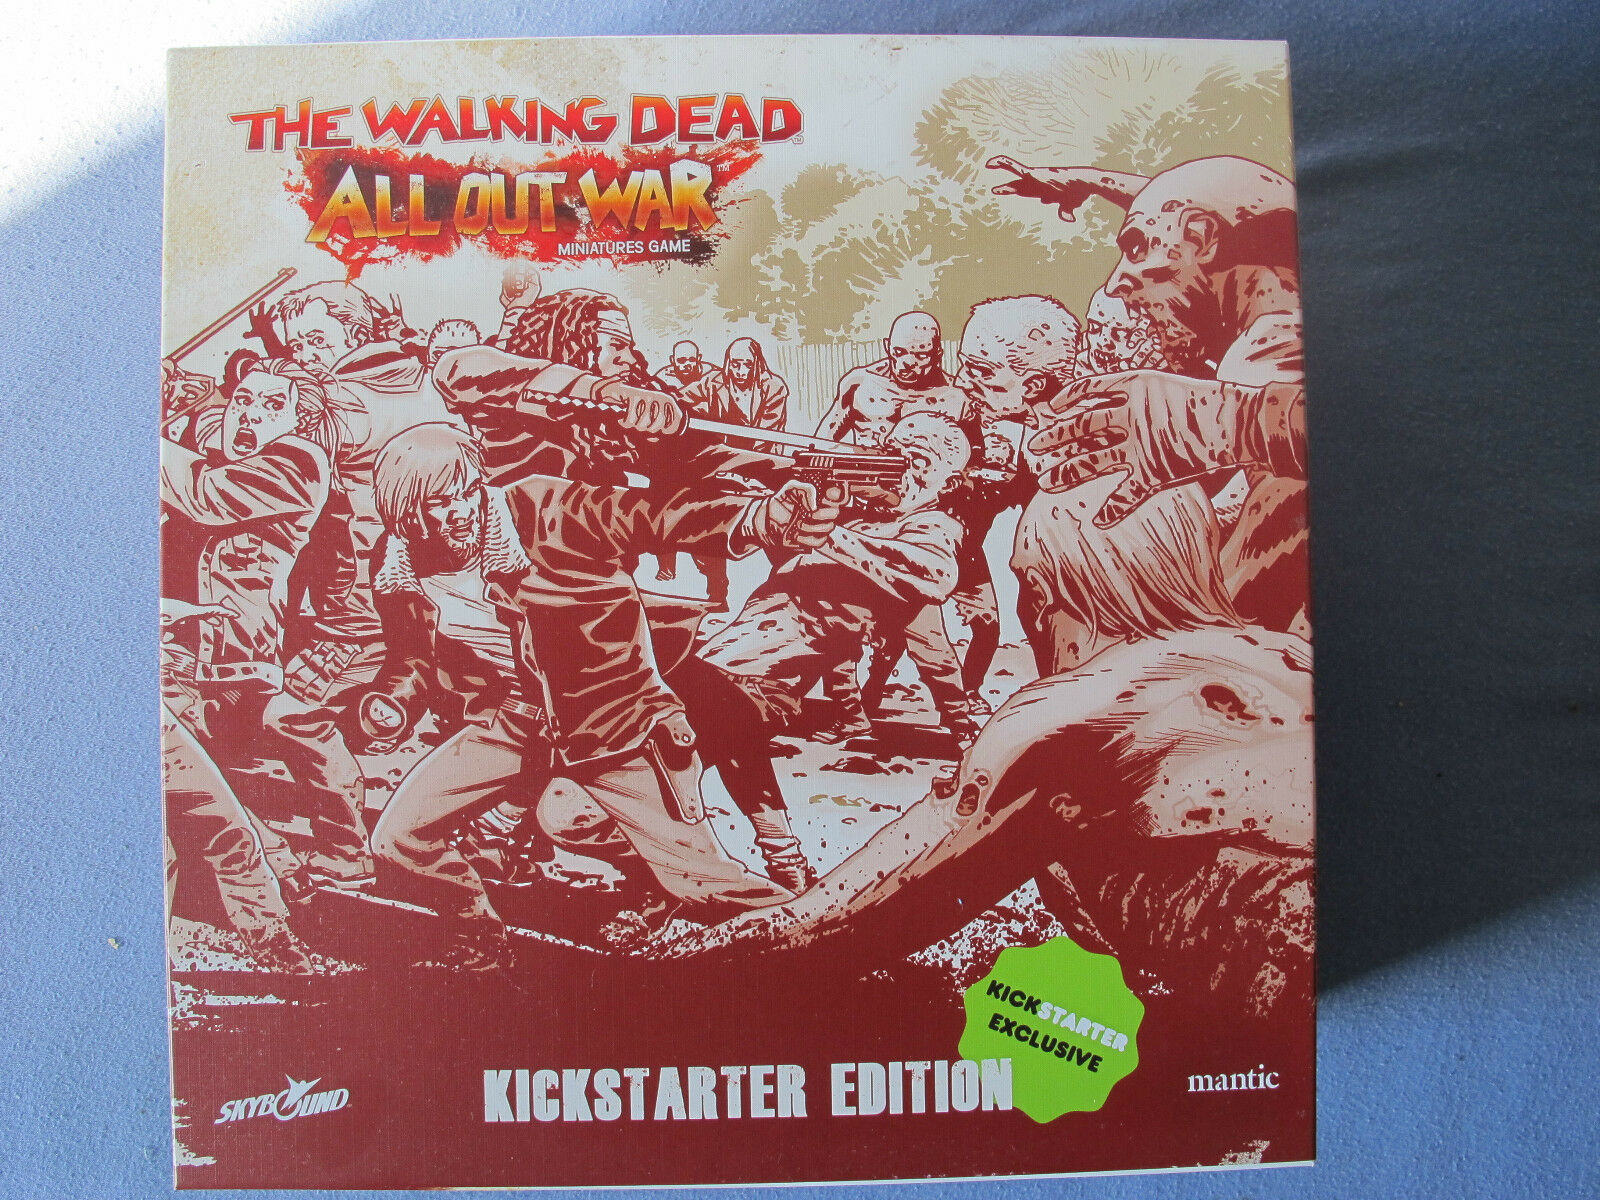 The Walre Dead tutti Out War Kick estrellater Editorion Expansion Miniatures gioco